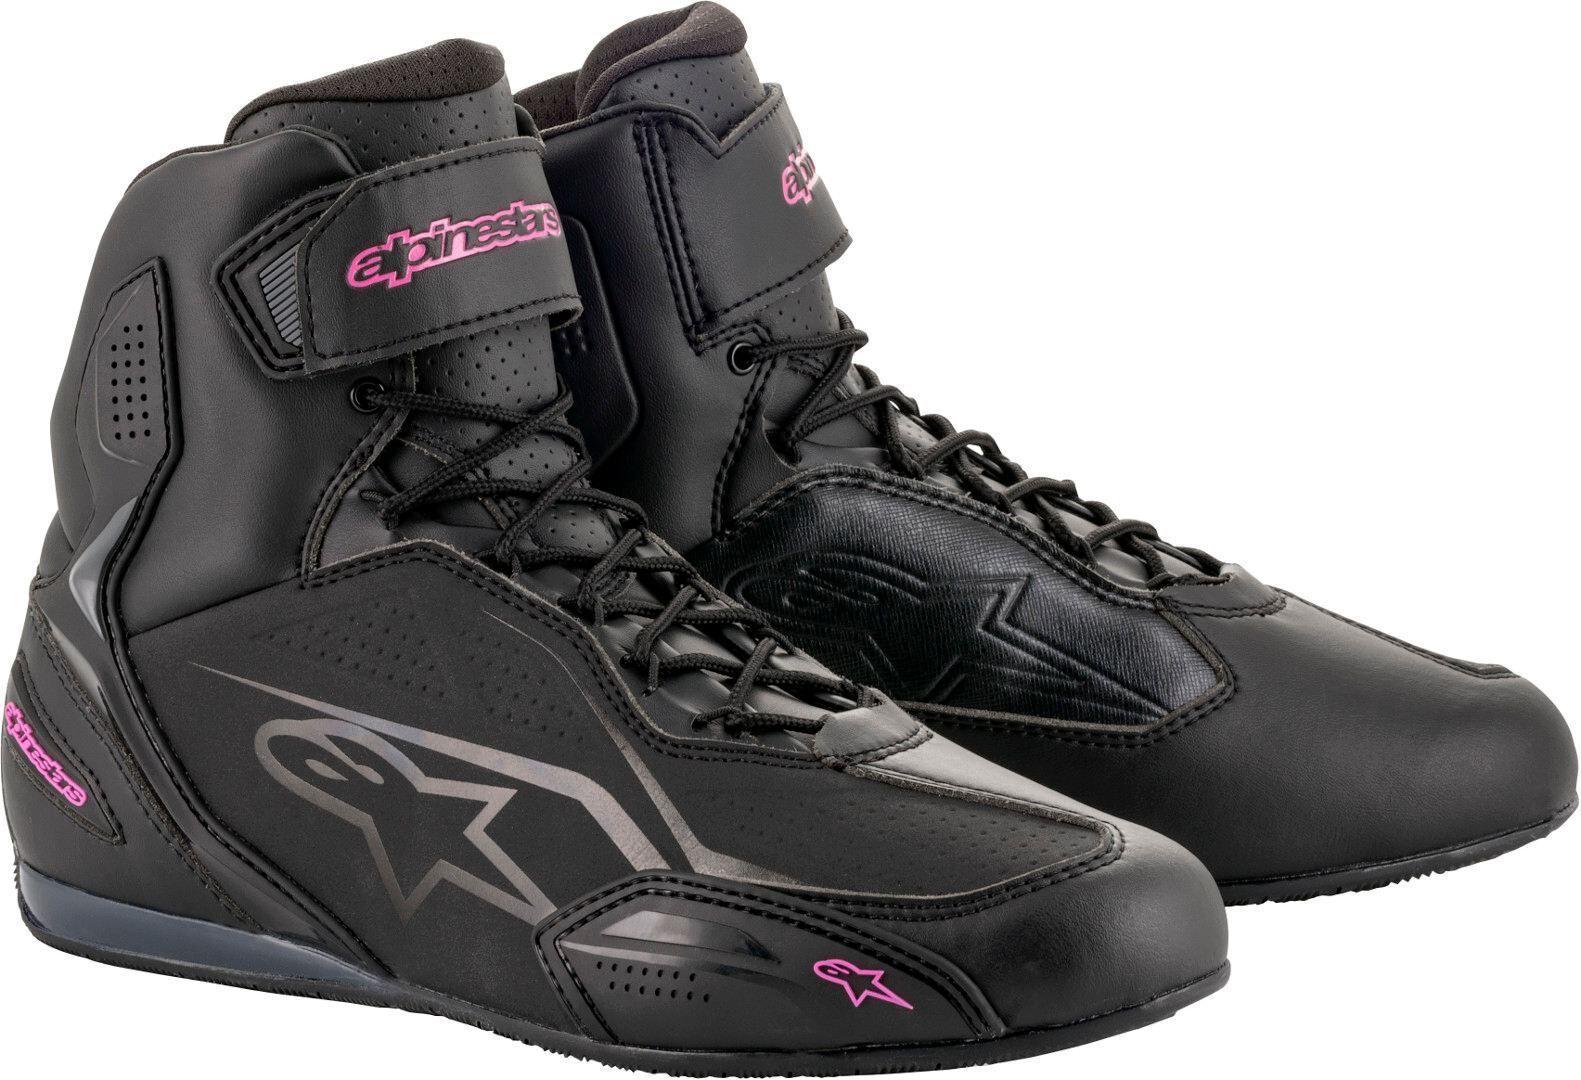 Alpinestars Stella Faster-3 Ladies Motorcycle Shoes Black Pink 39